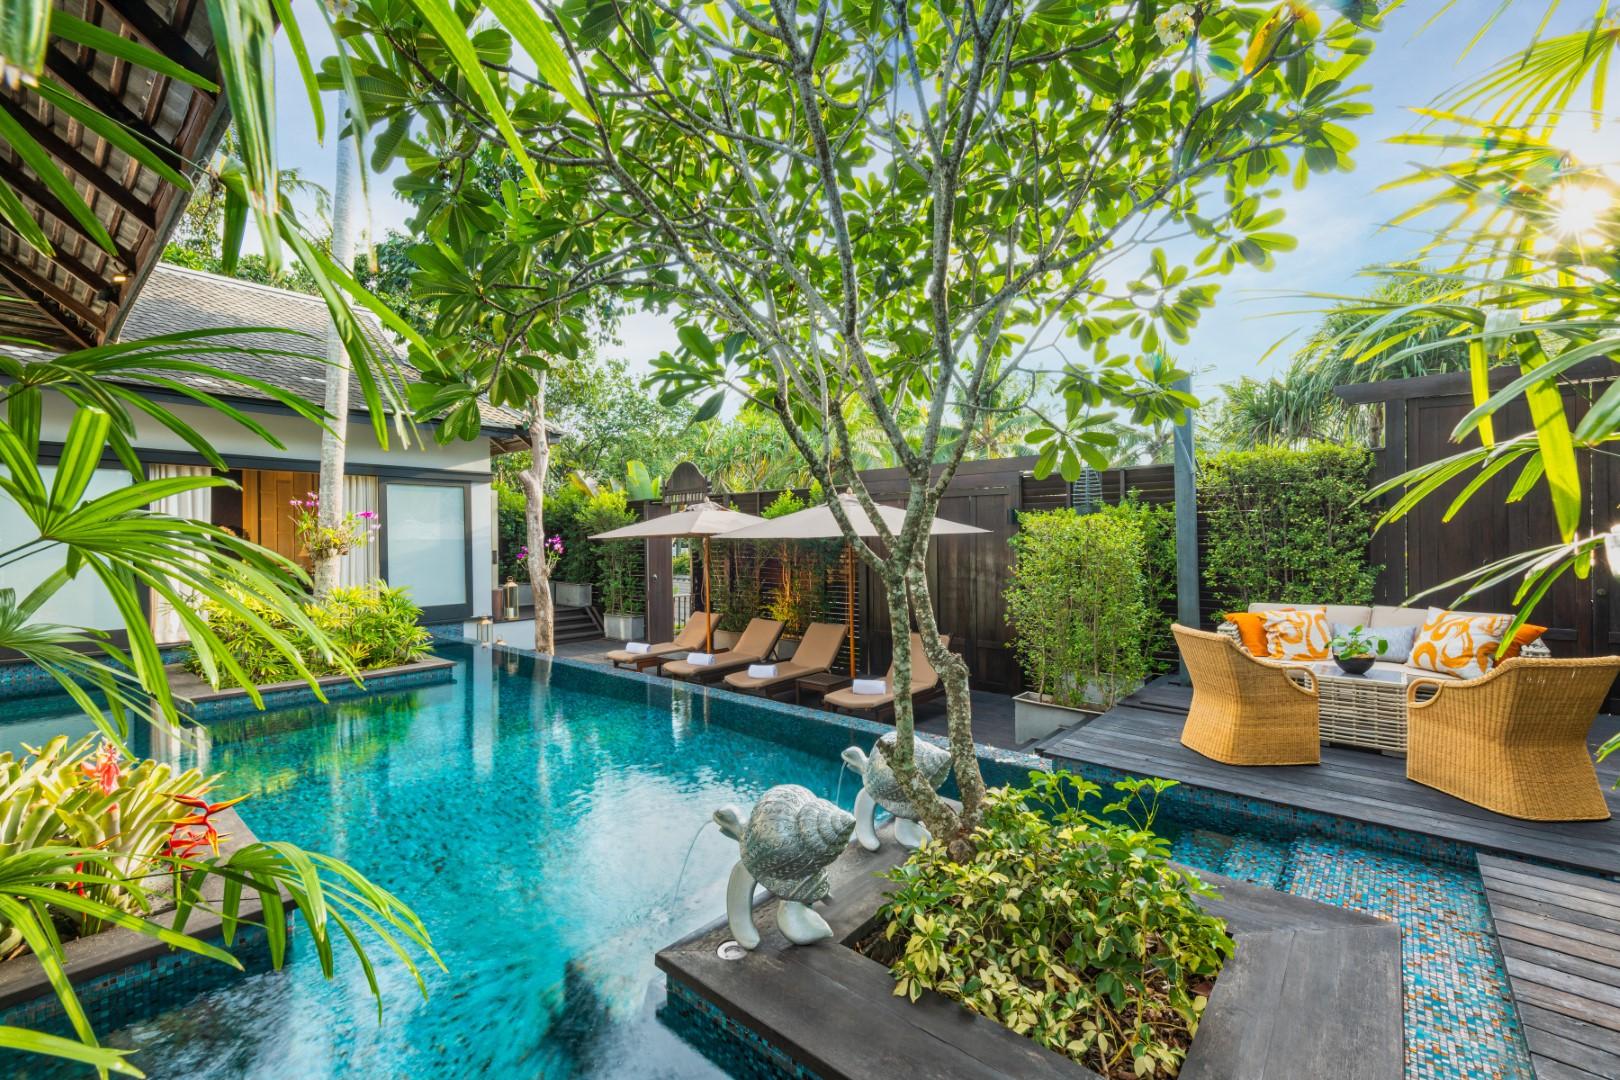 Anantara Mai Khao Phuket Villas – Two Bedroom Royal Villa by Jim Thompson (Large)